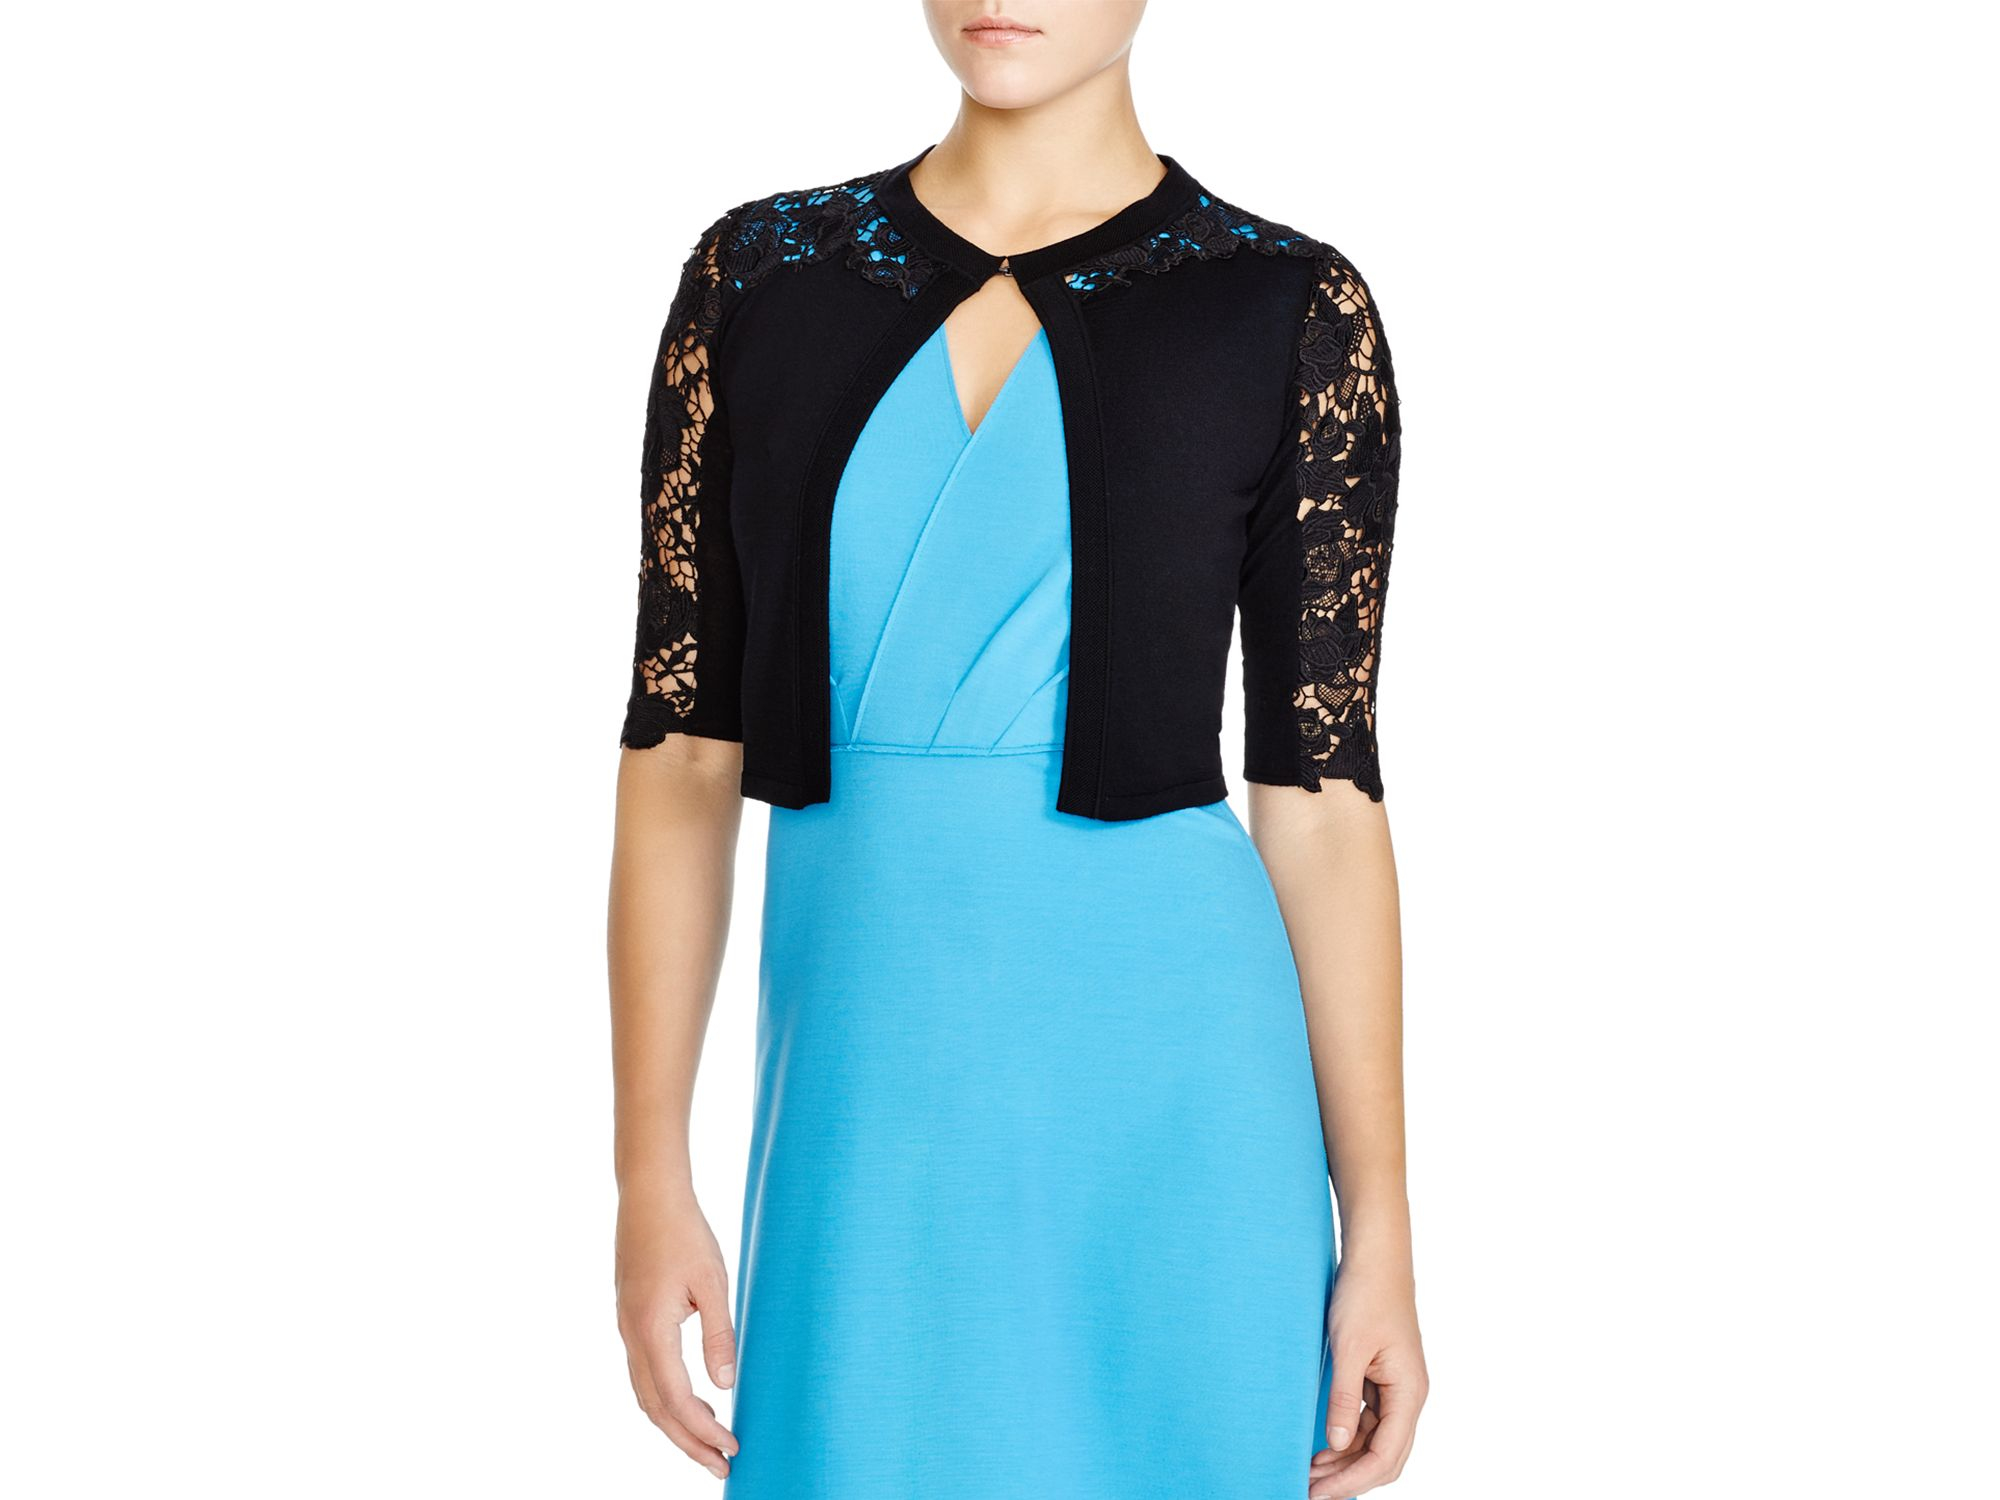 Elie tahari Morocco Lace Inset Crop Cardigan in Black   Lyst